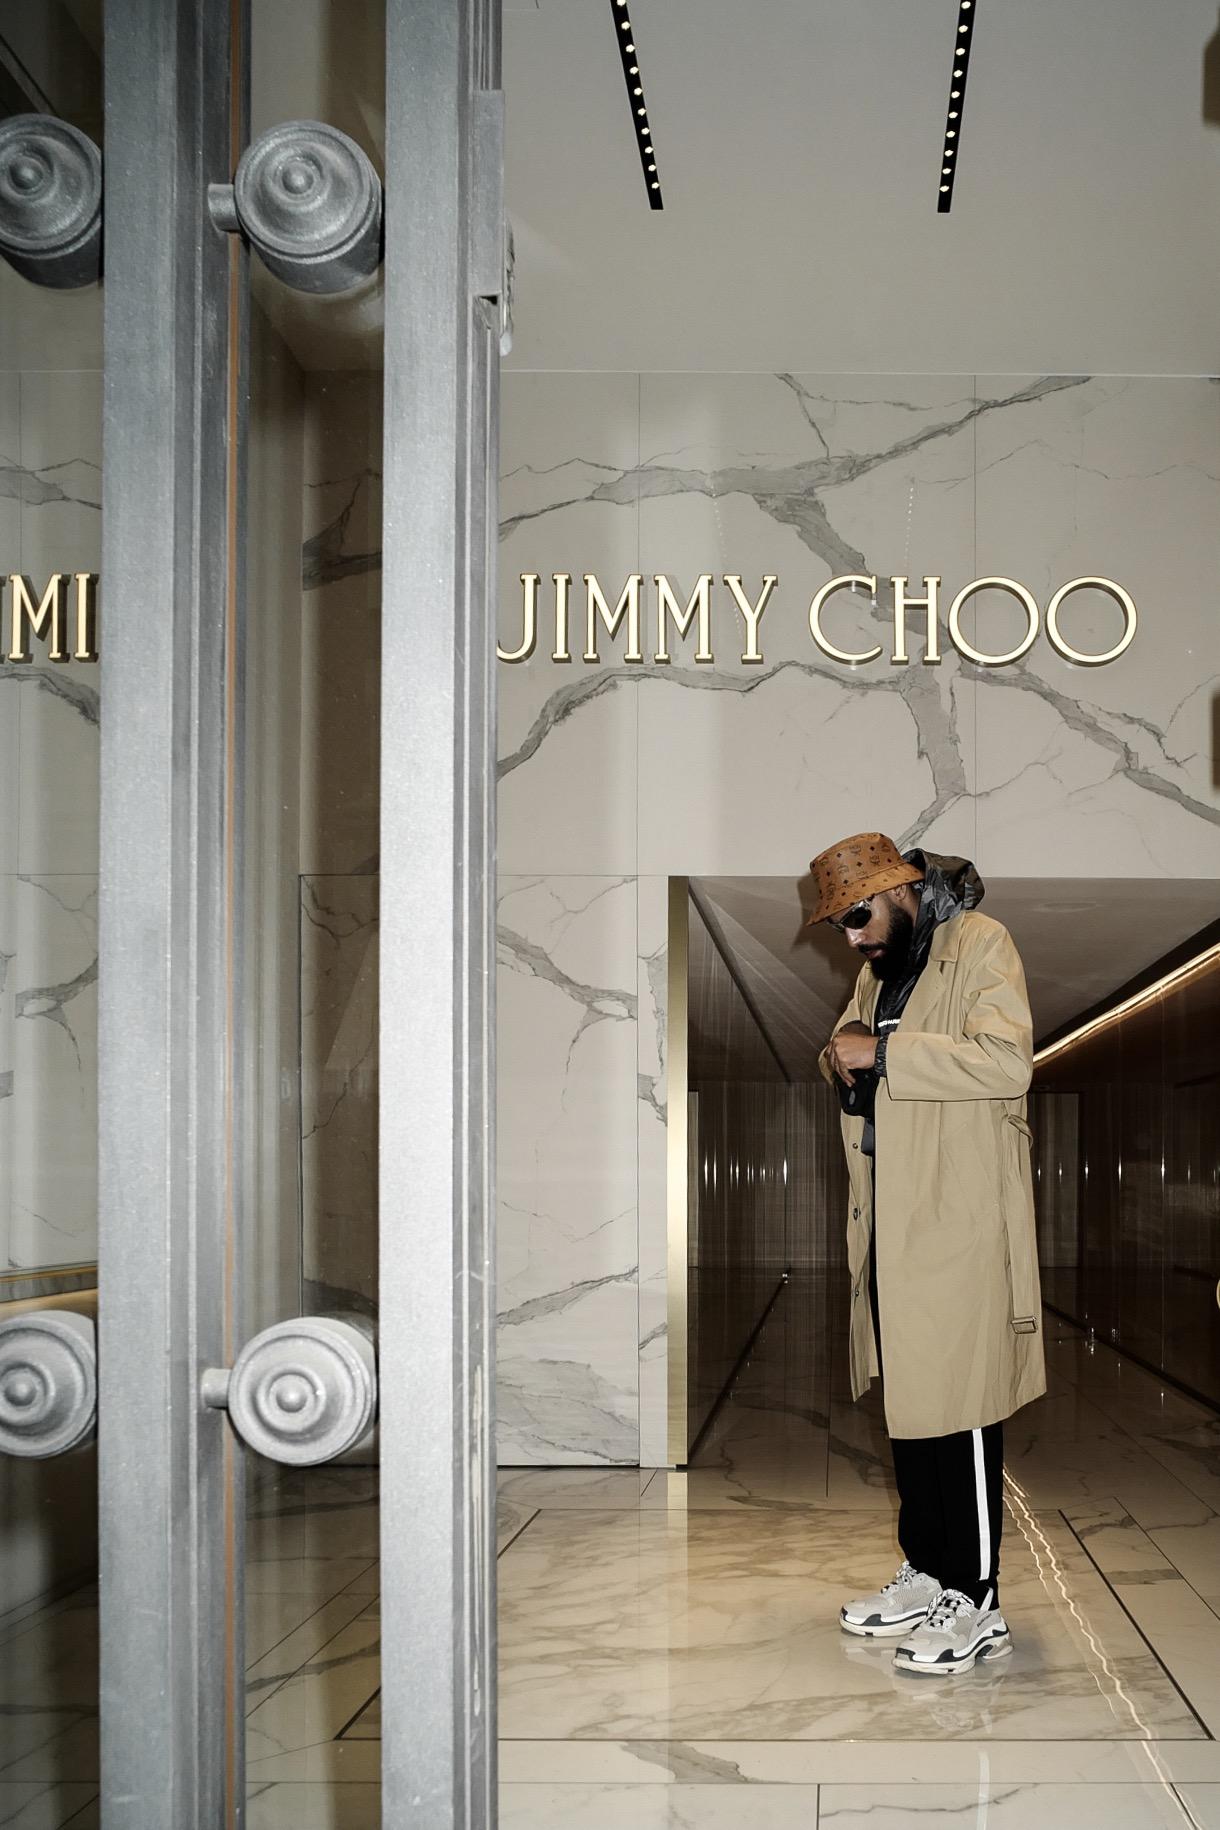 Jimmy Choo Fall/Winter 19 Presentation